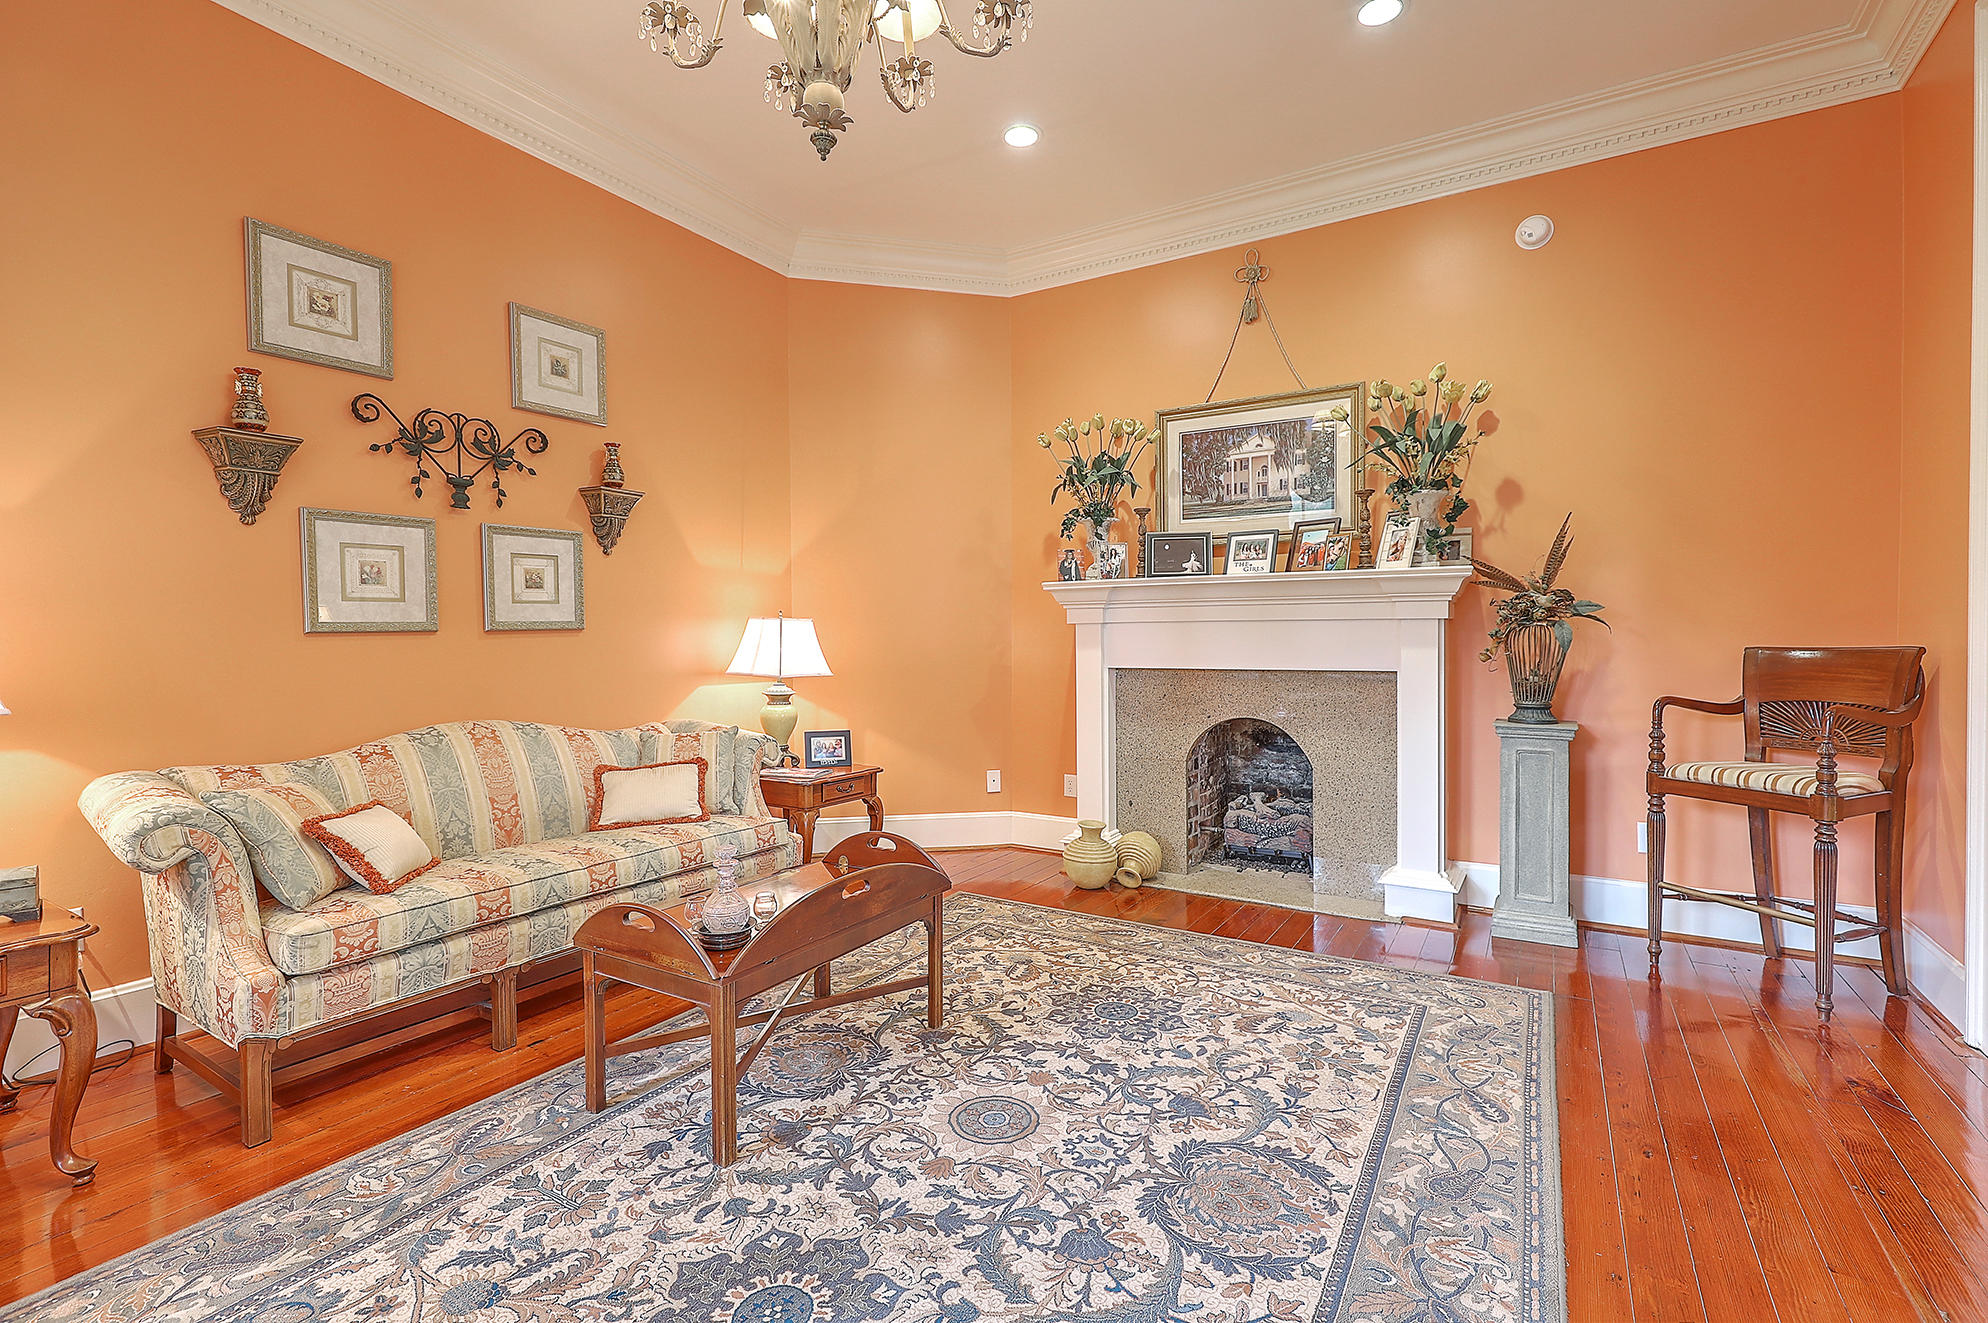 Summerville Homes For Sale - 102 Hickory, Summerville, SC - 41